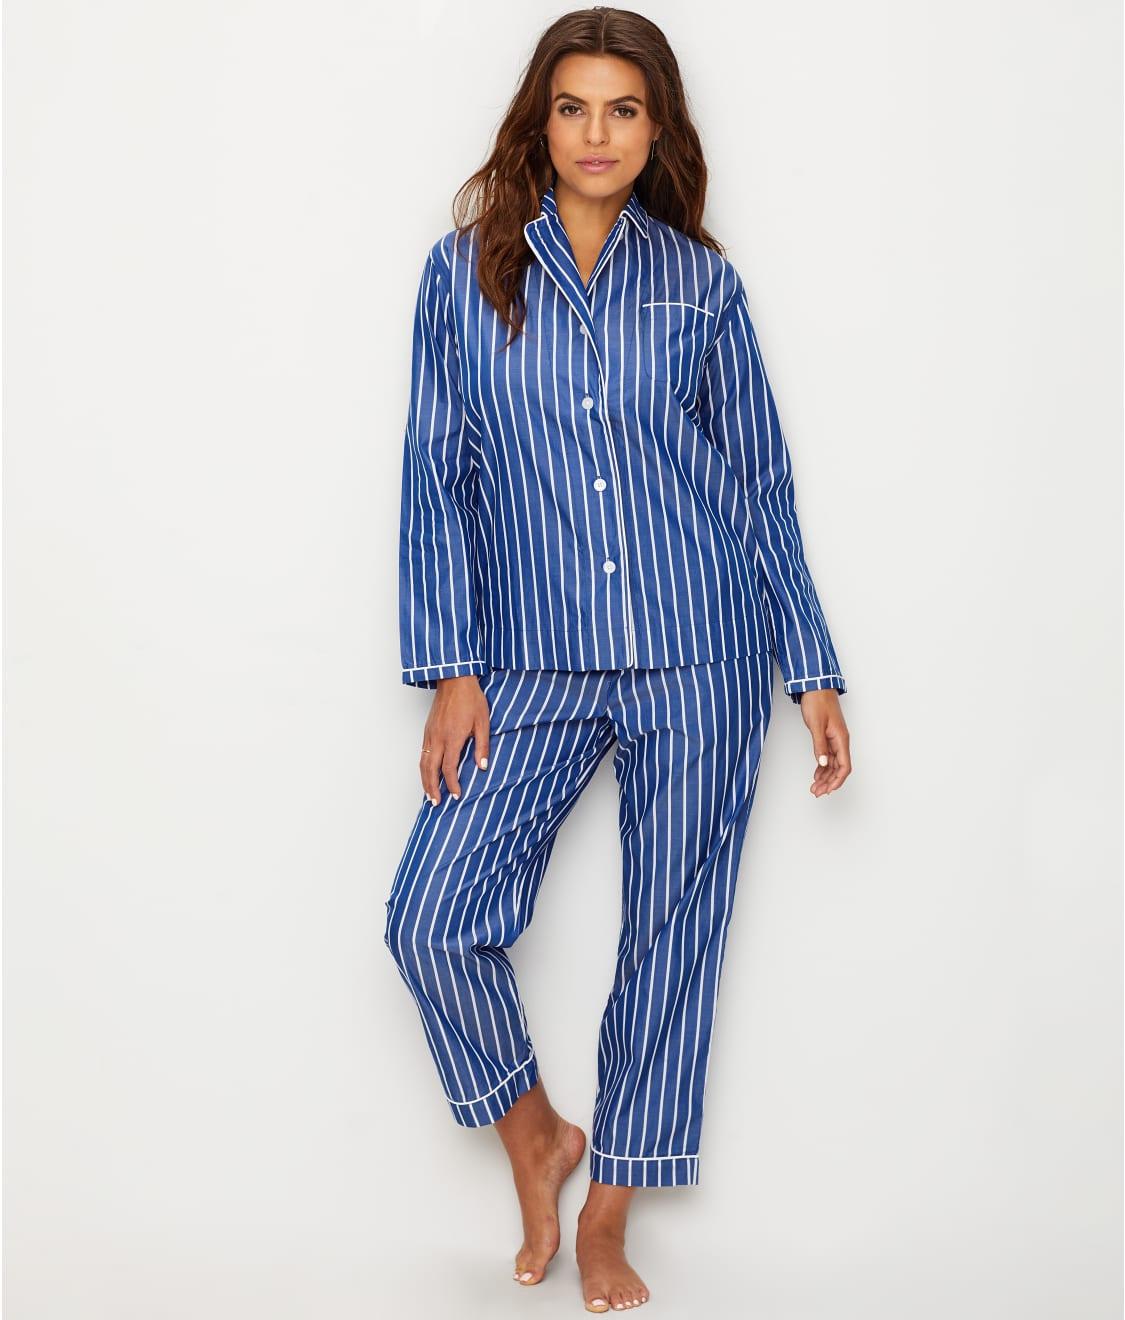 ab75cd2c69 Sleepy Jones Bishop Stripe Woven Cotton Pajama Set